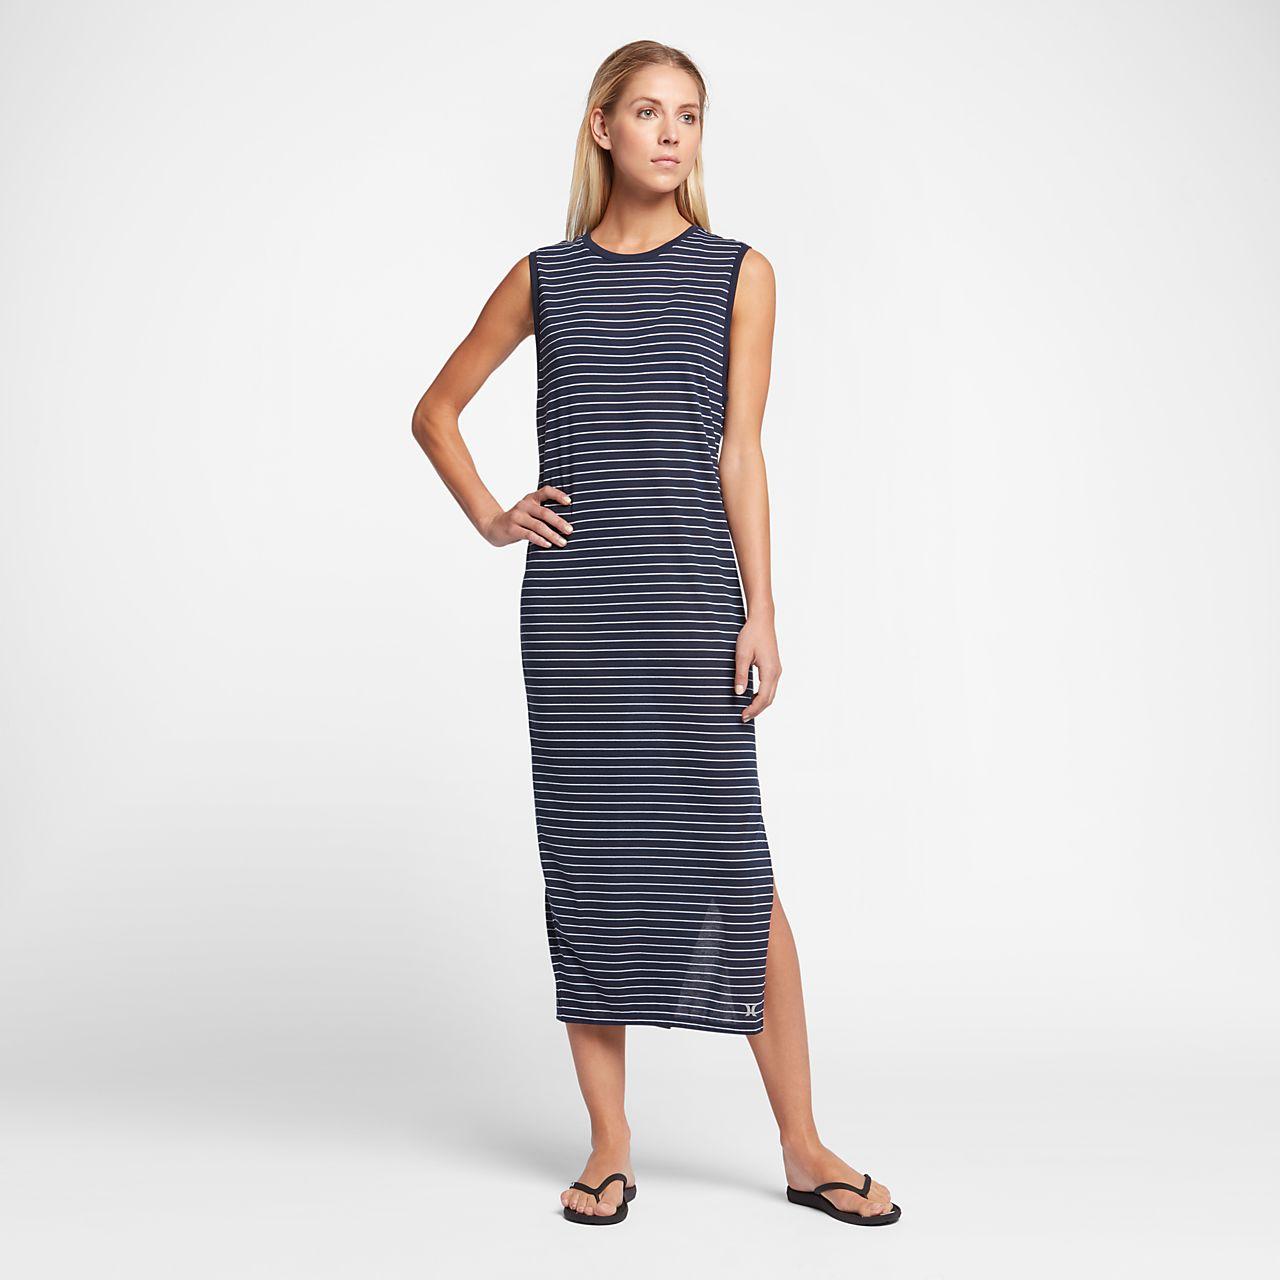 Hurley Dri FIT Captain Women's Dress